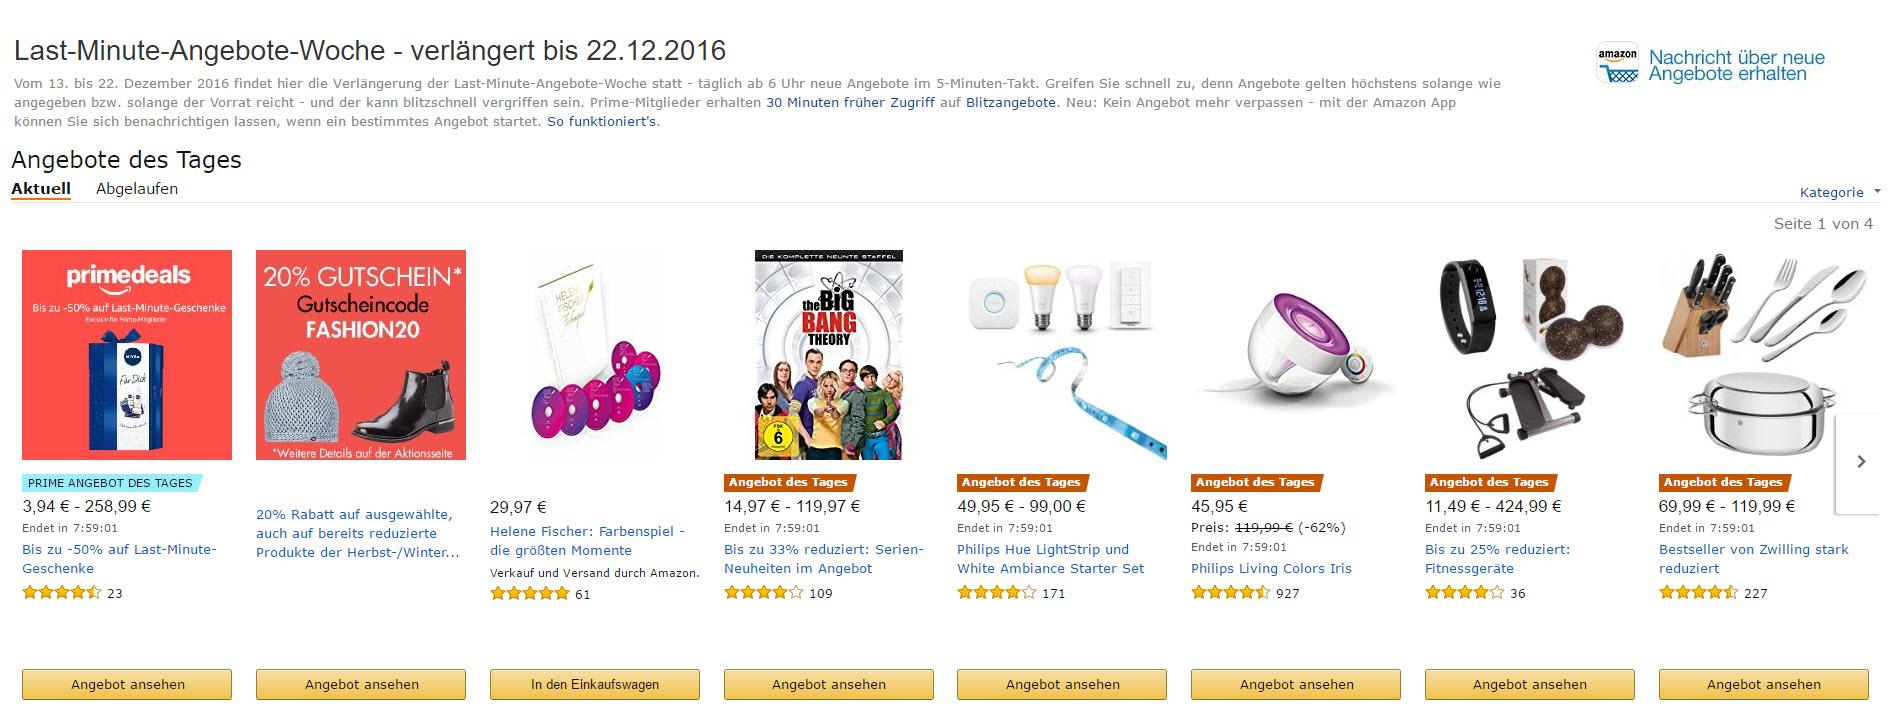 Amazon Startet Am 26 Dezember Winter Angebote Zdnetde